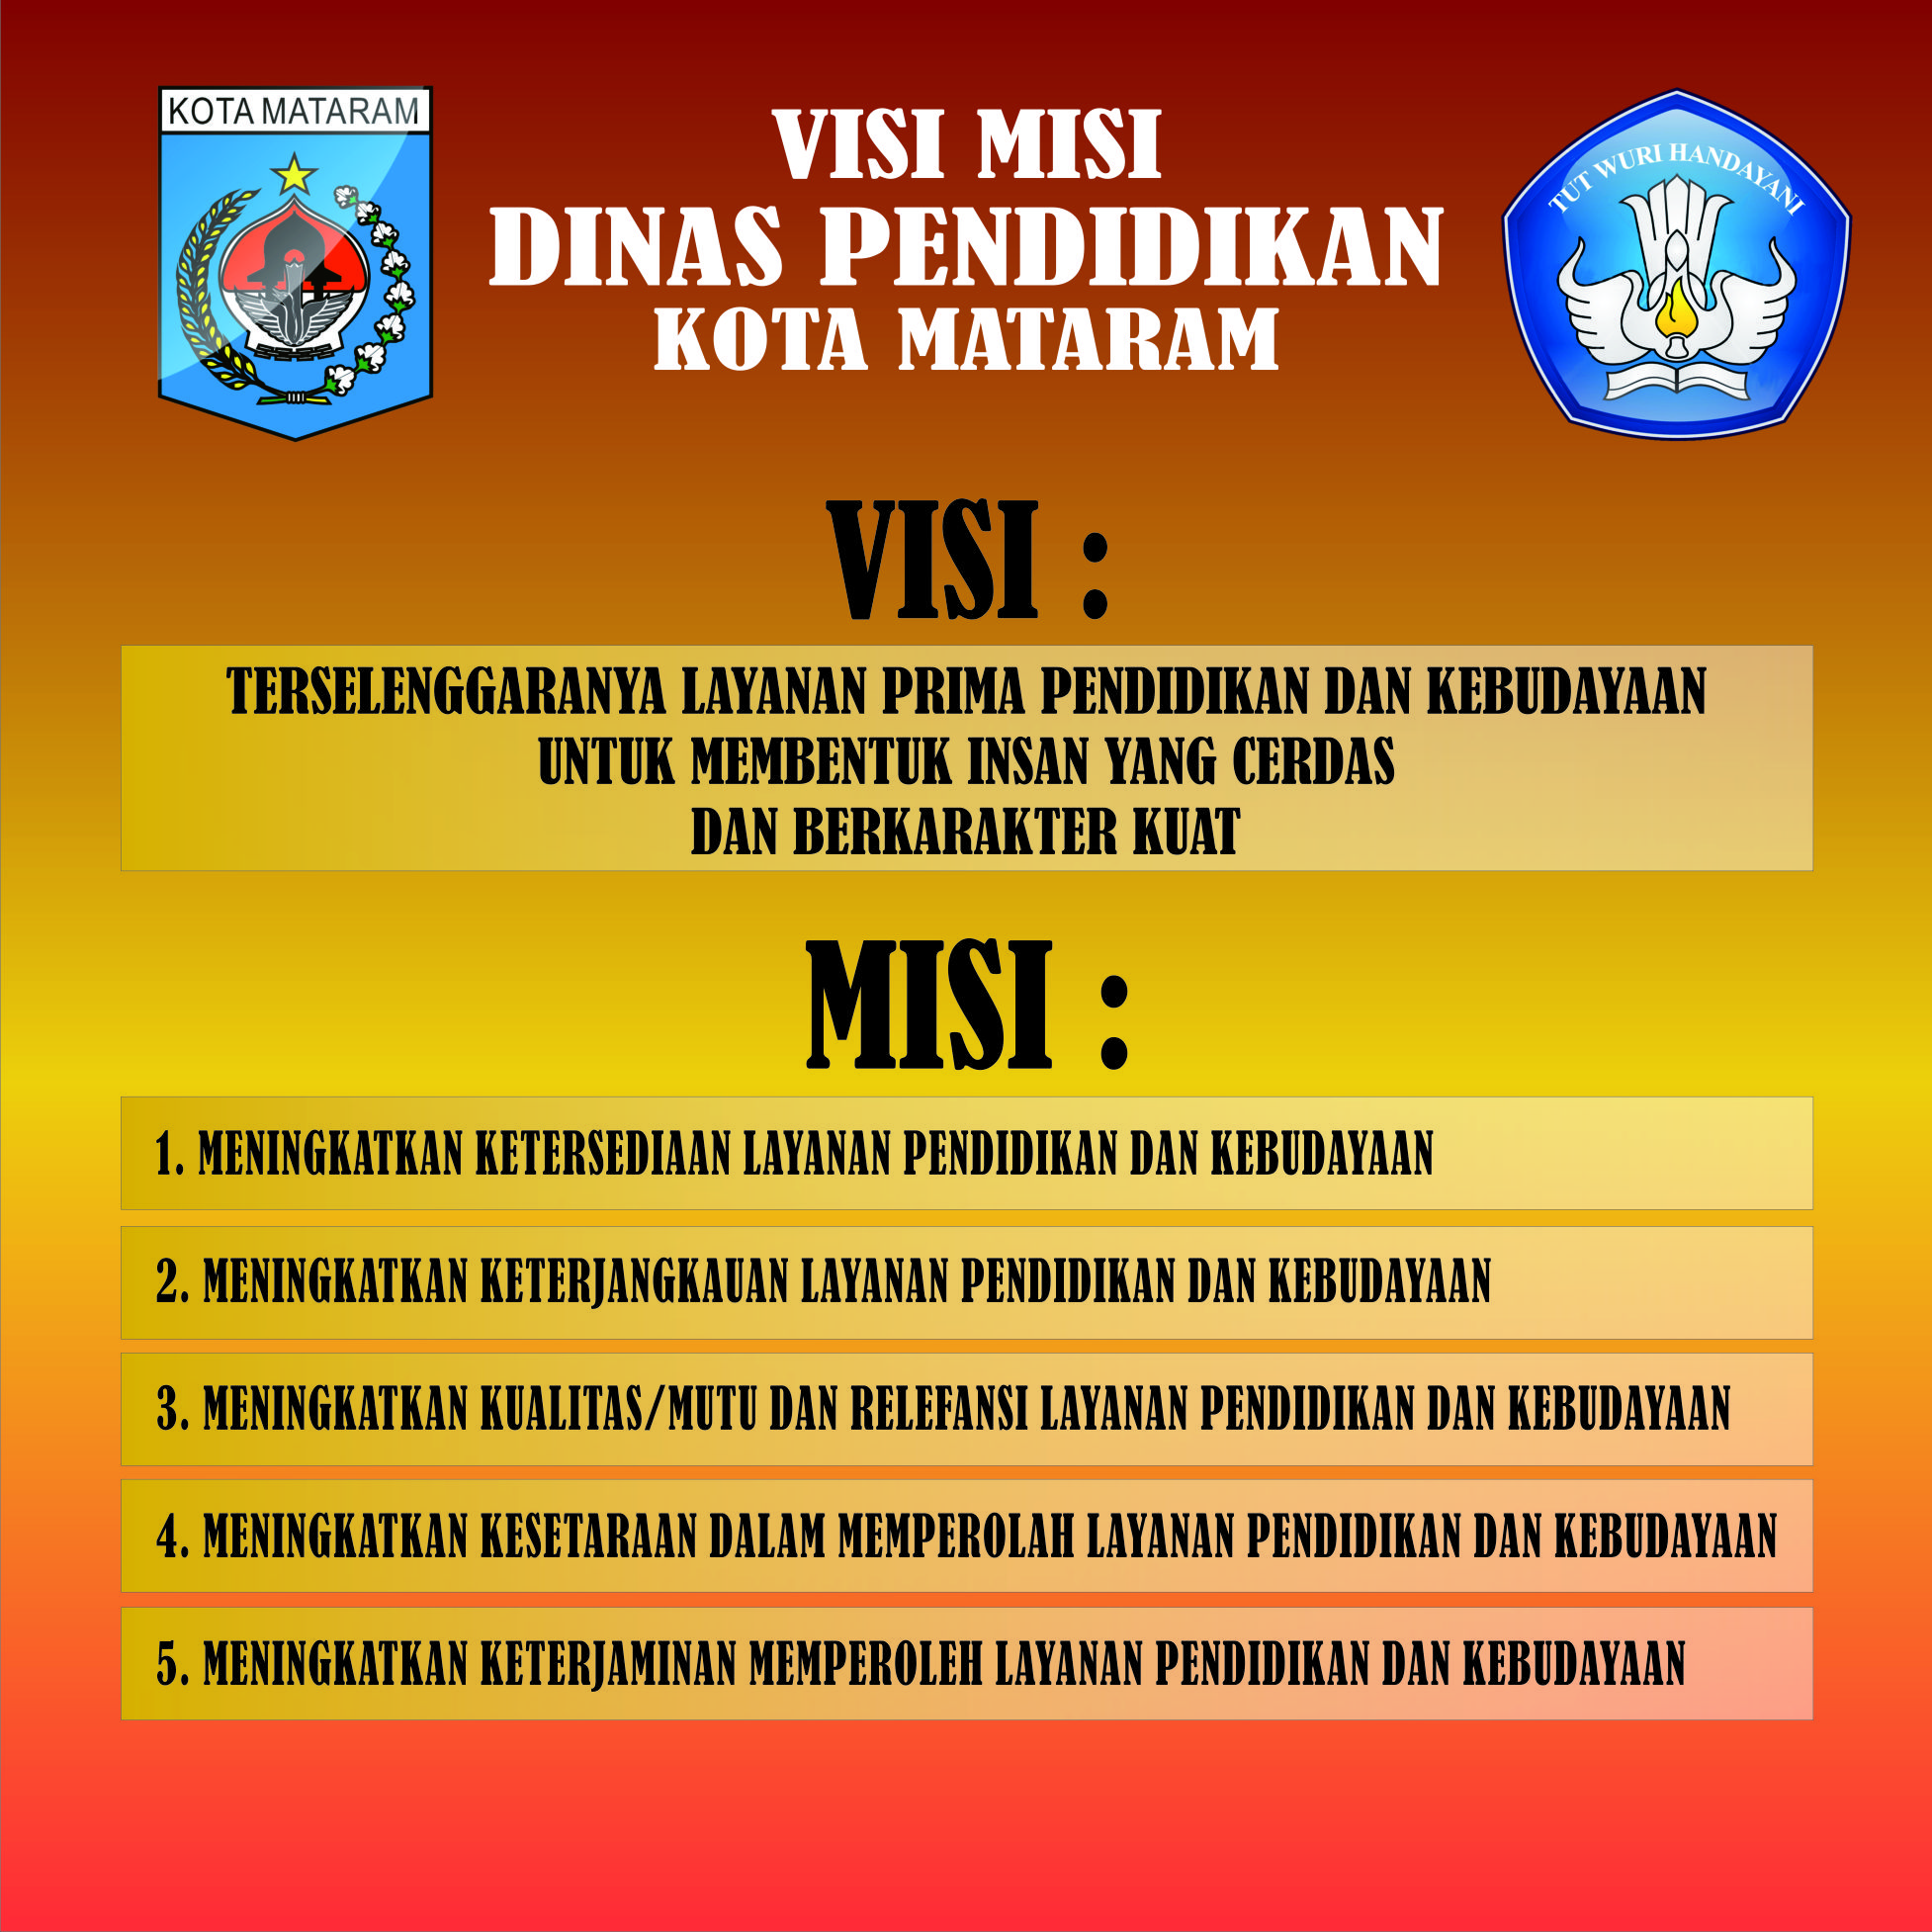 Visi_Misi_Small